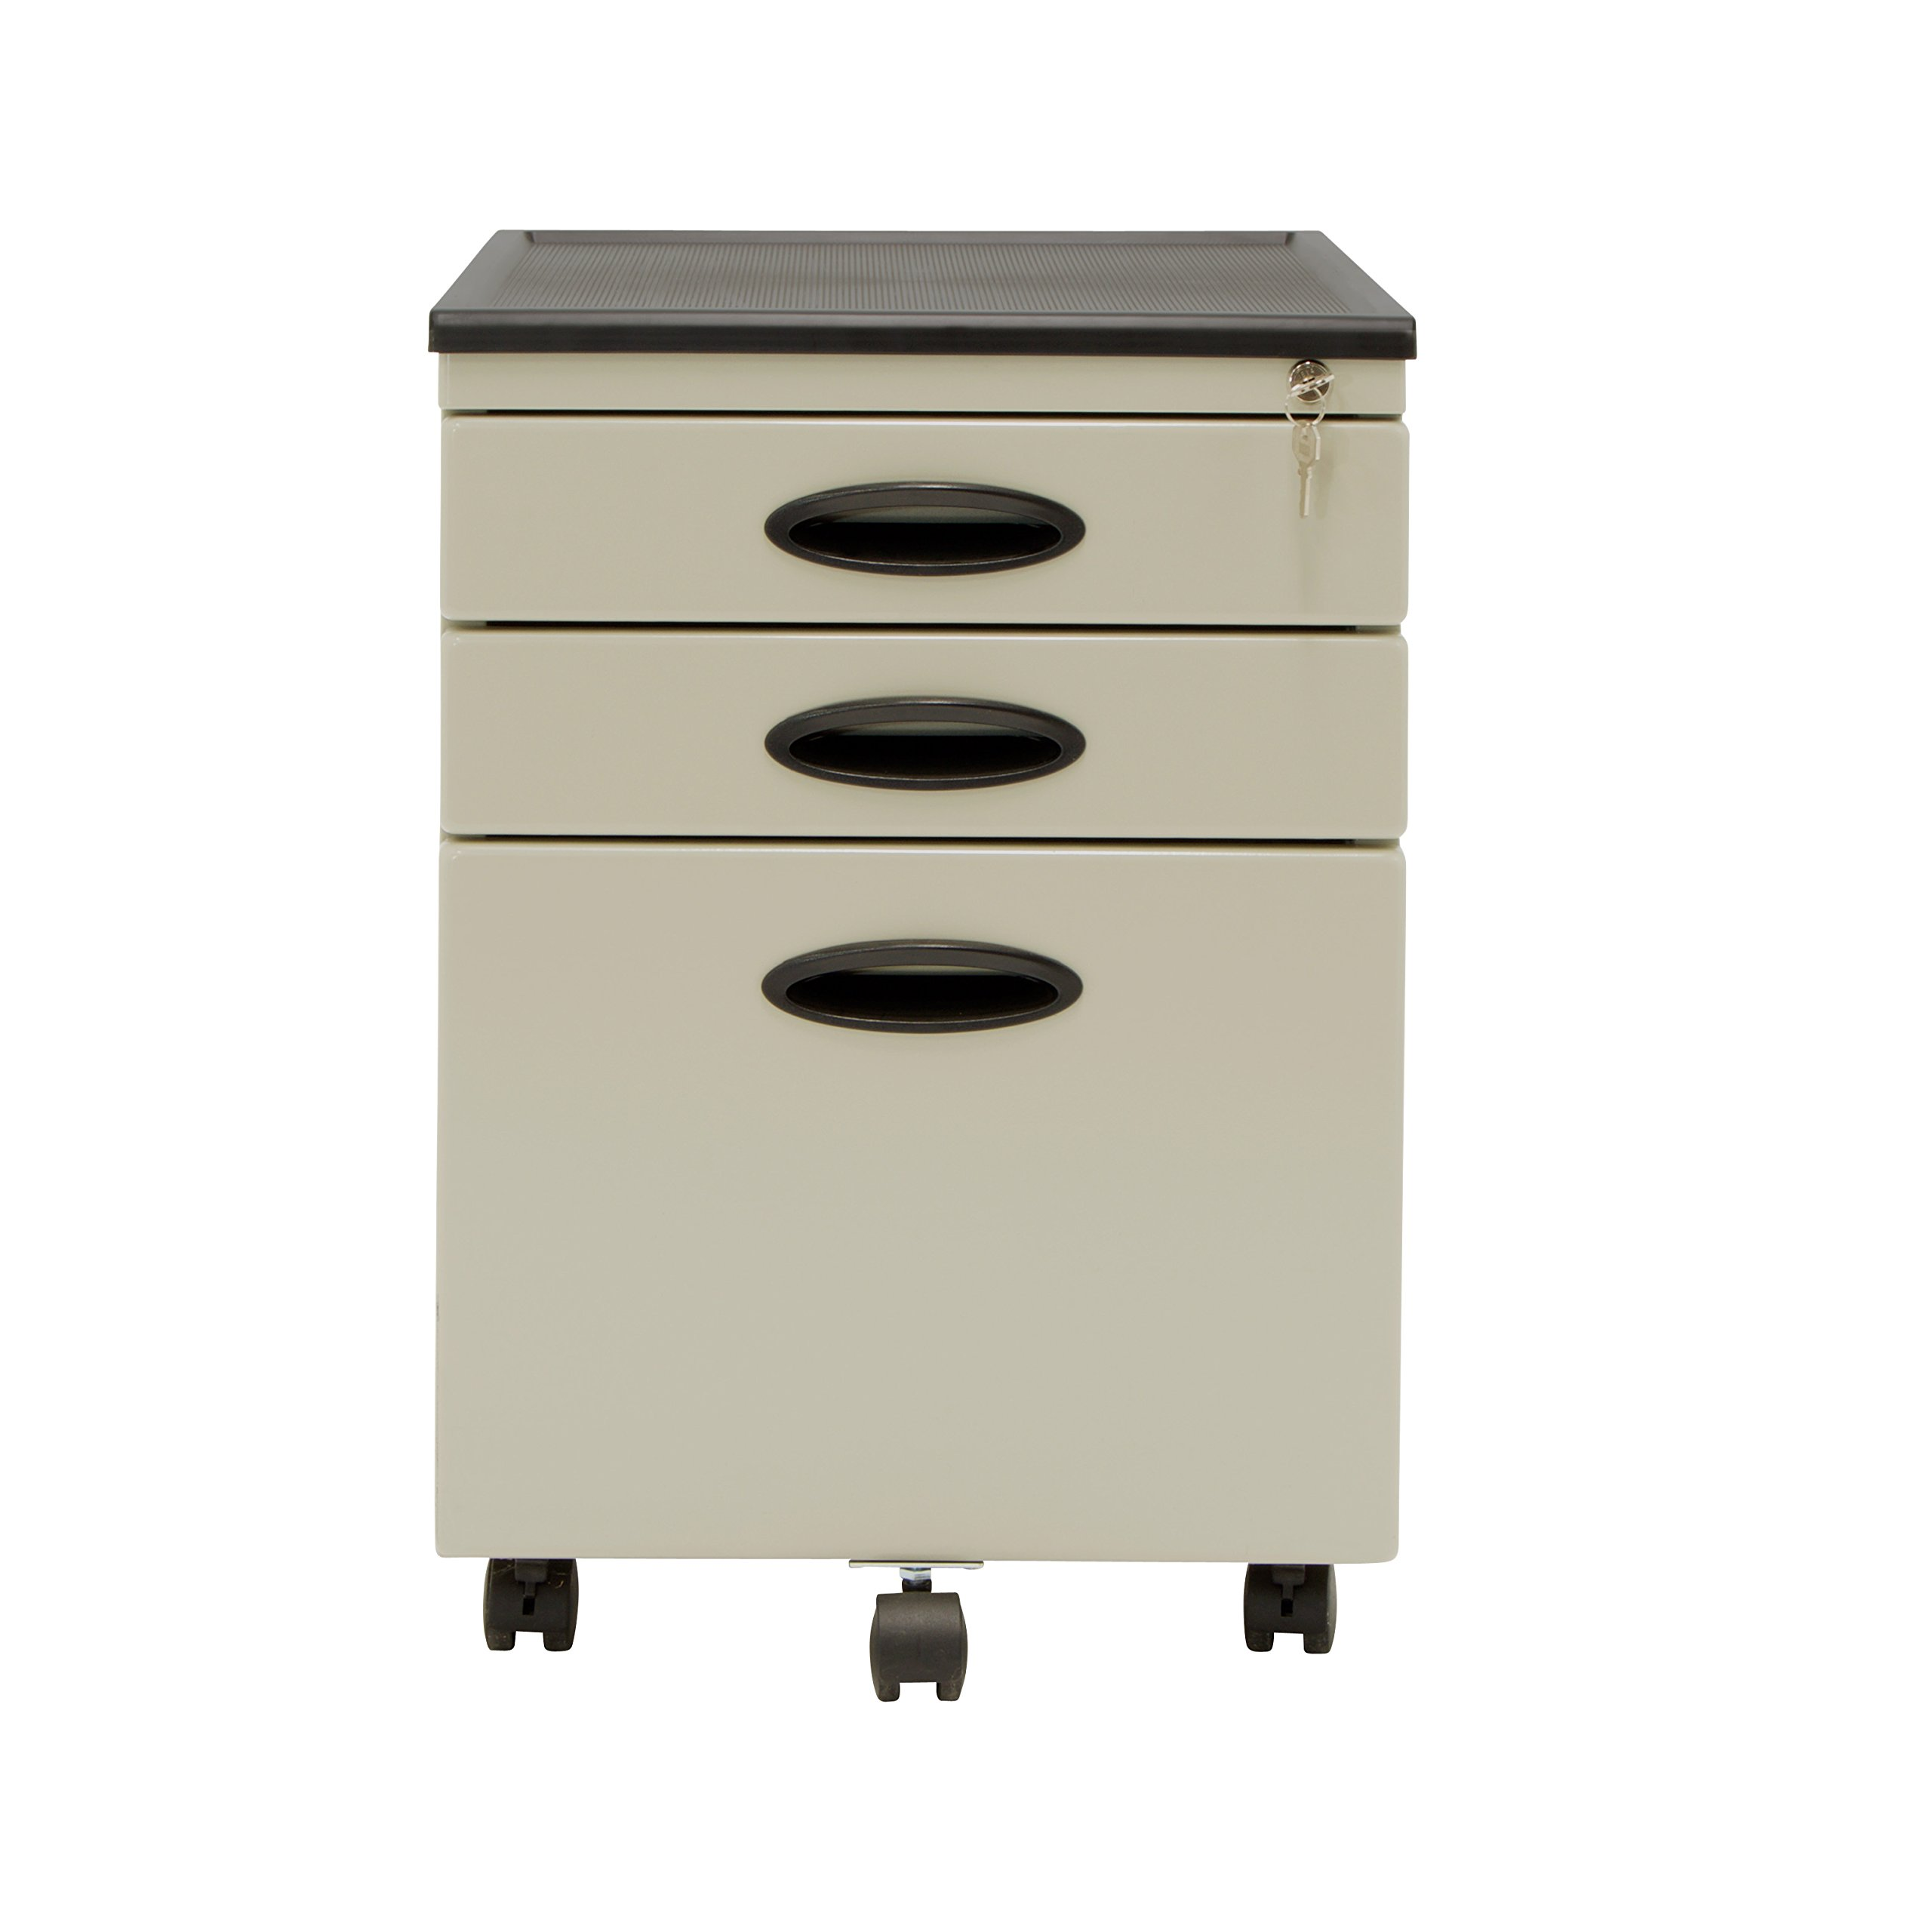 Studio Designs 51104 Calico Designs File Cabinet, Multicolor by Studio Designs